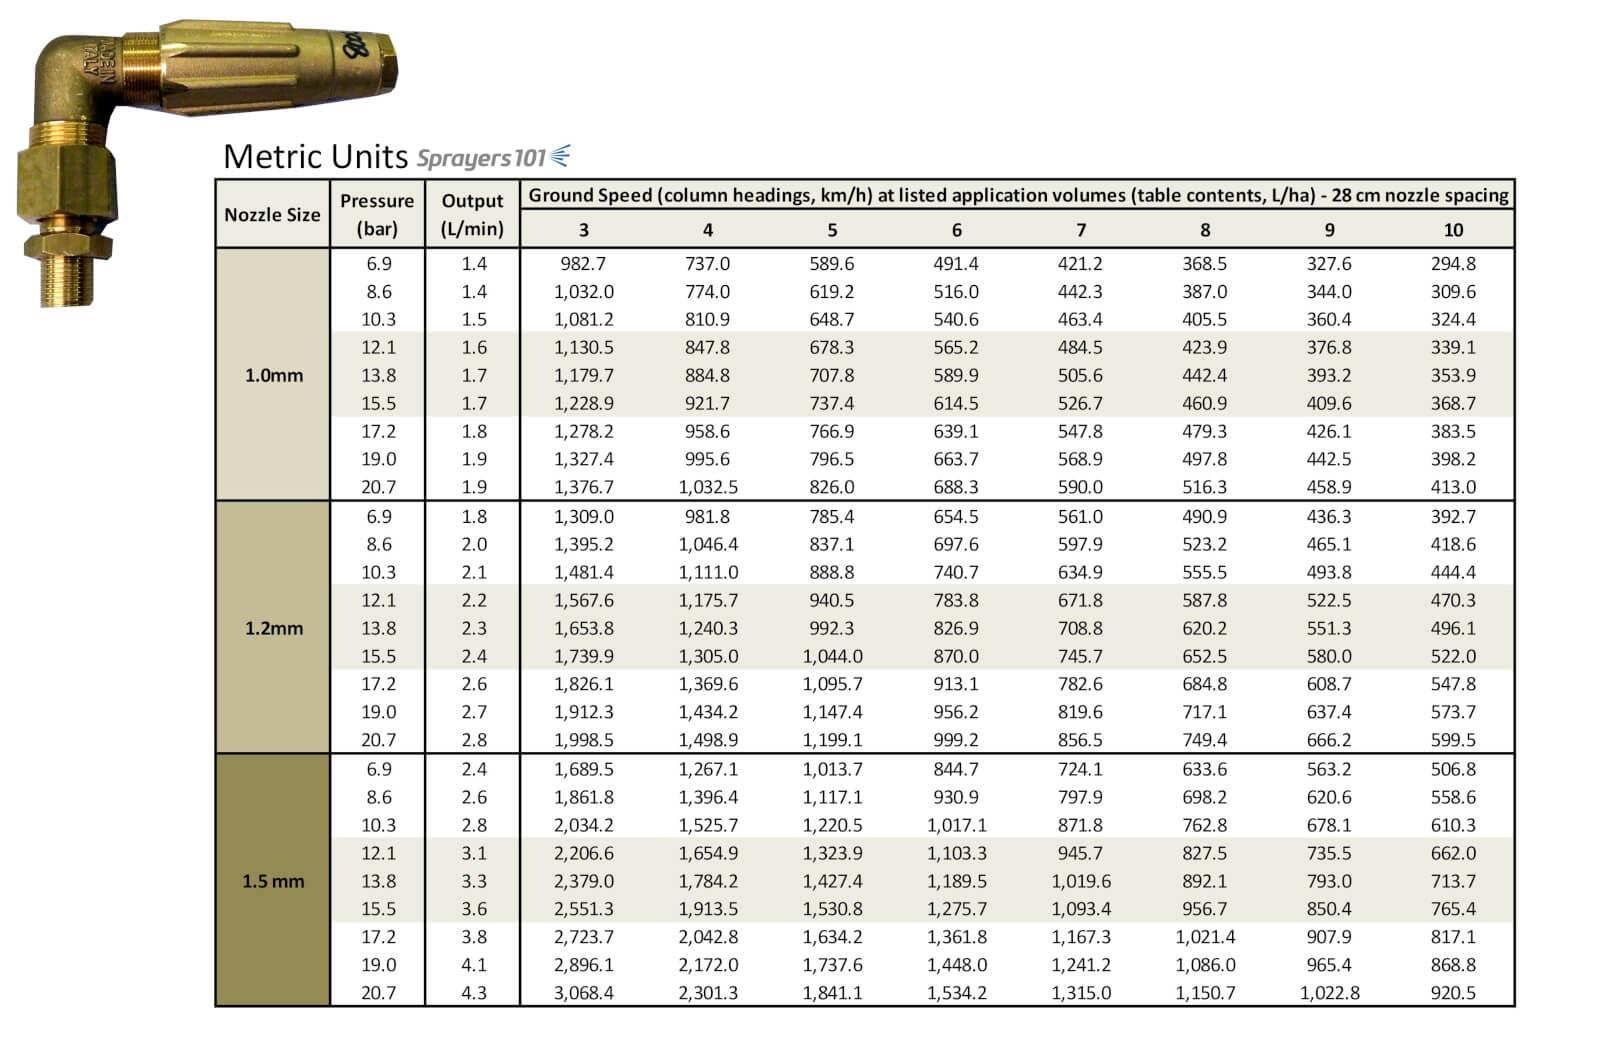 Arag microjet rate tables   Sprayers 101